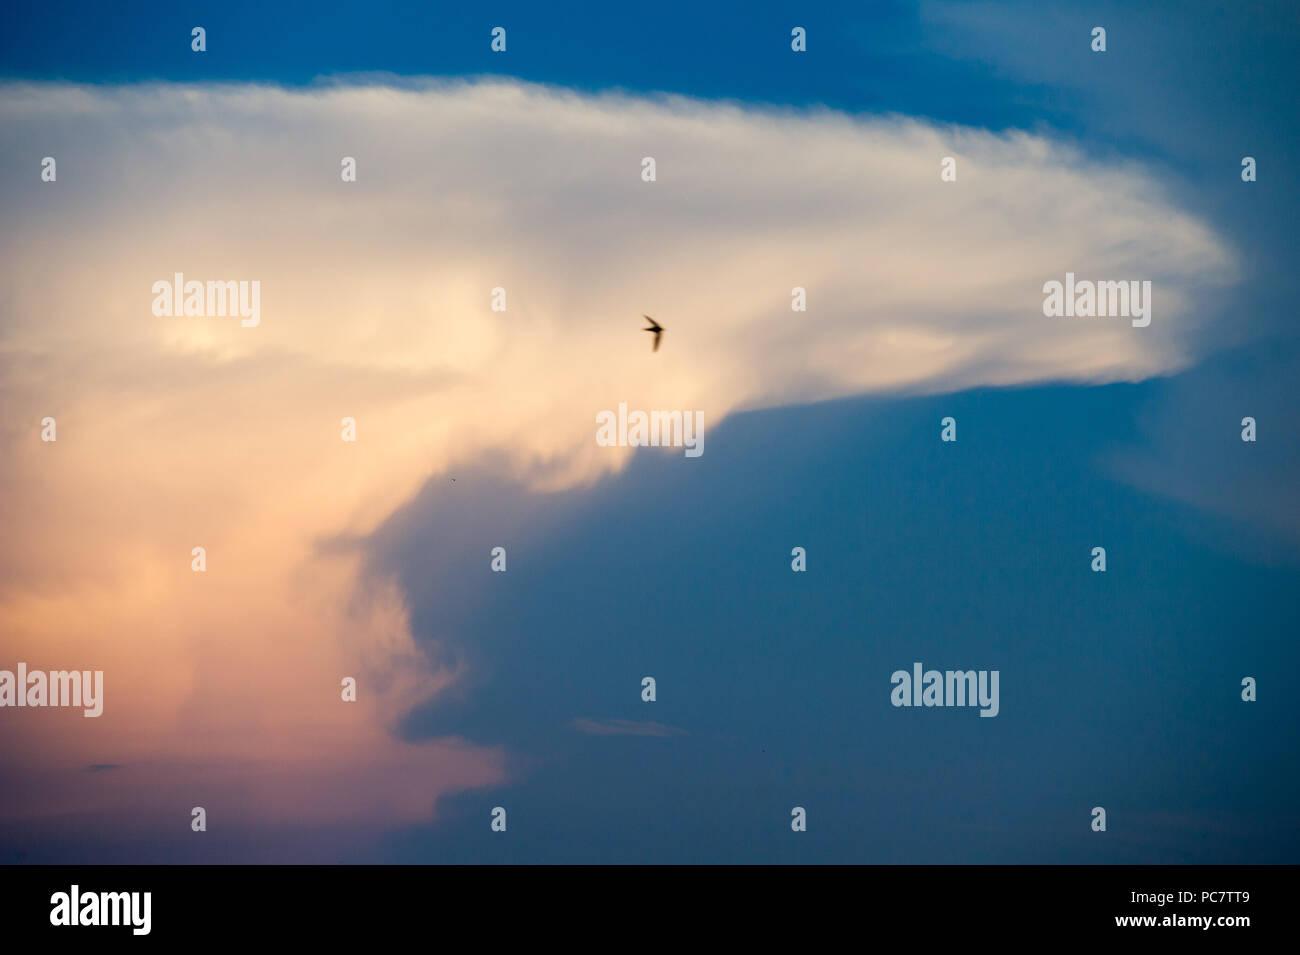 Cumulonimbus cloud in Gdansk, Poland. July 28th 2018 © Wojciech Strozyk / Alamy Stock Photo Stock Photo